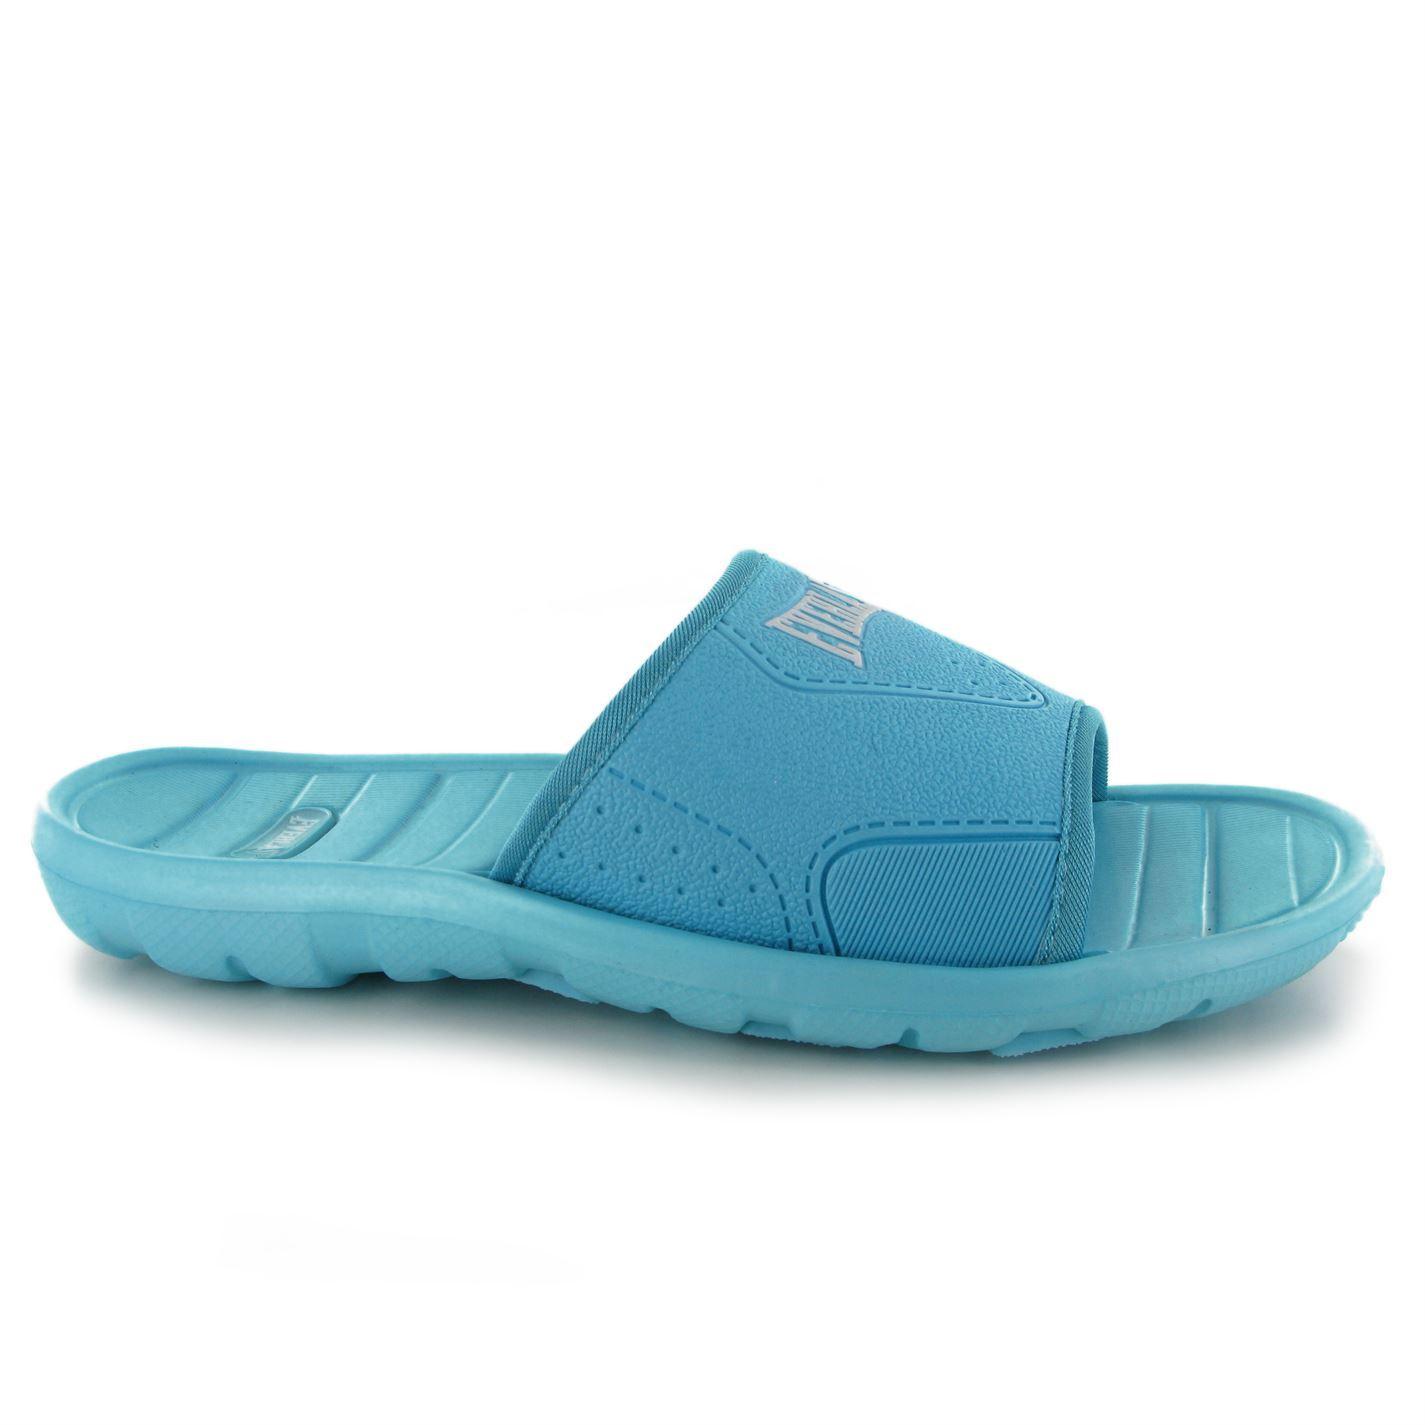 everlast womens ladies pool shoes water swimming shower beach sport sandals ebay